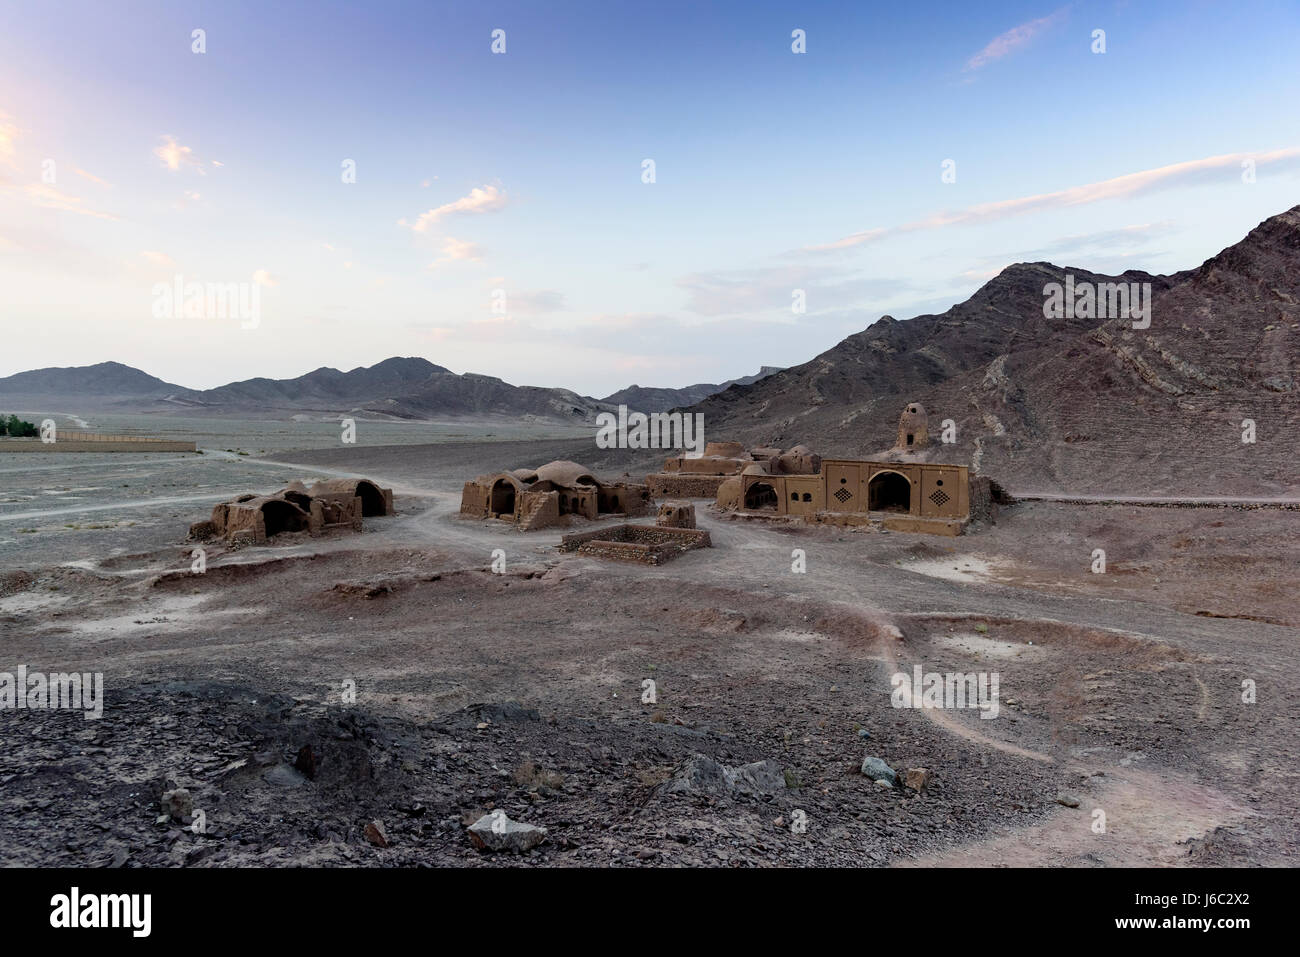 IRAN YAZD TOWER OF SILENCE AND VILLAGE Zoroaster - Stock Image